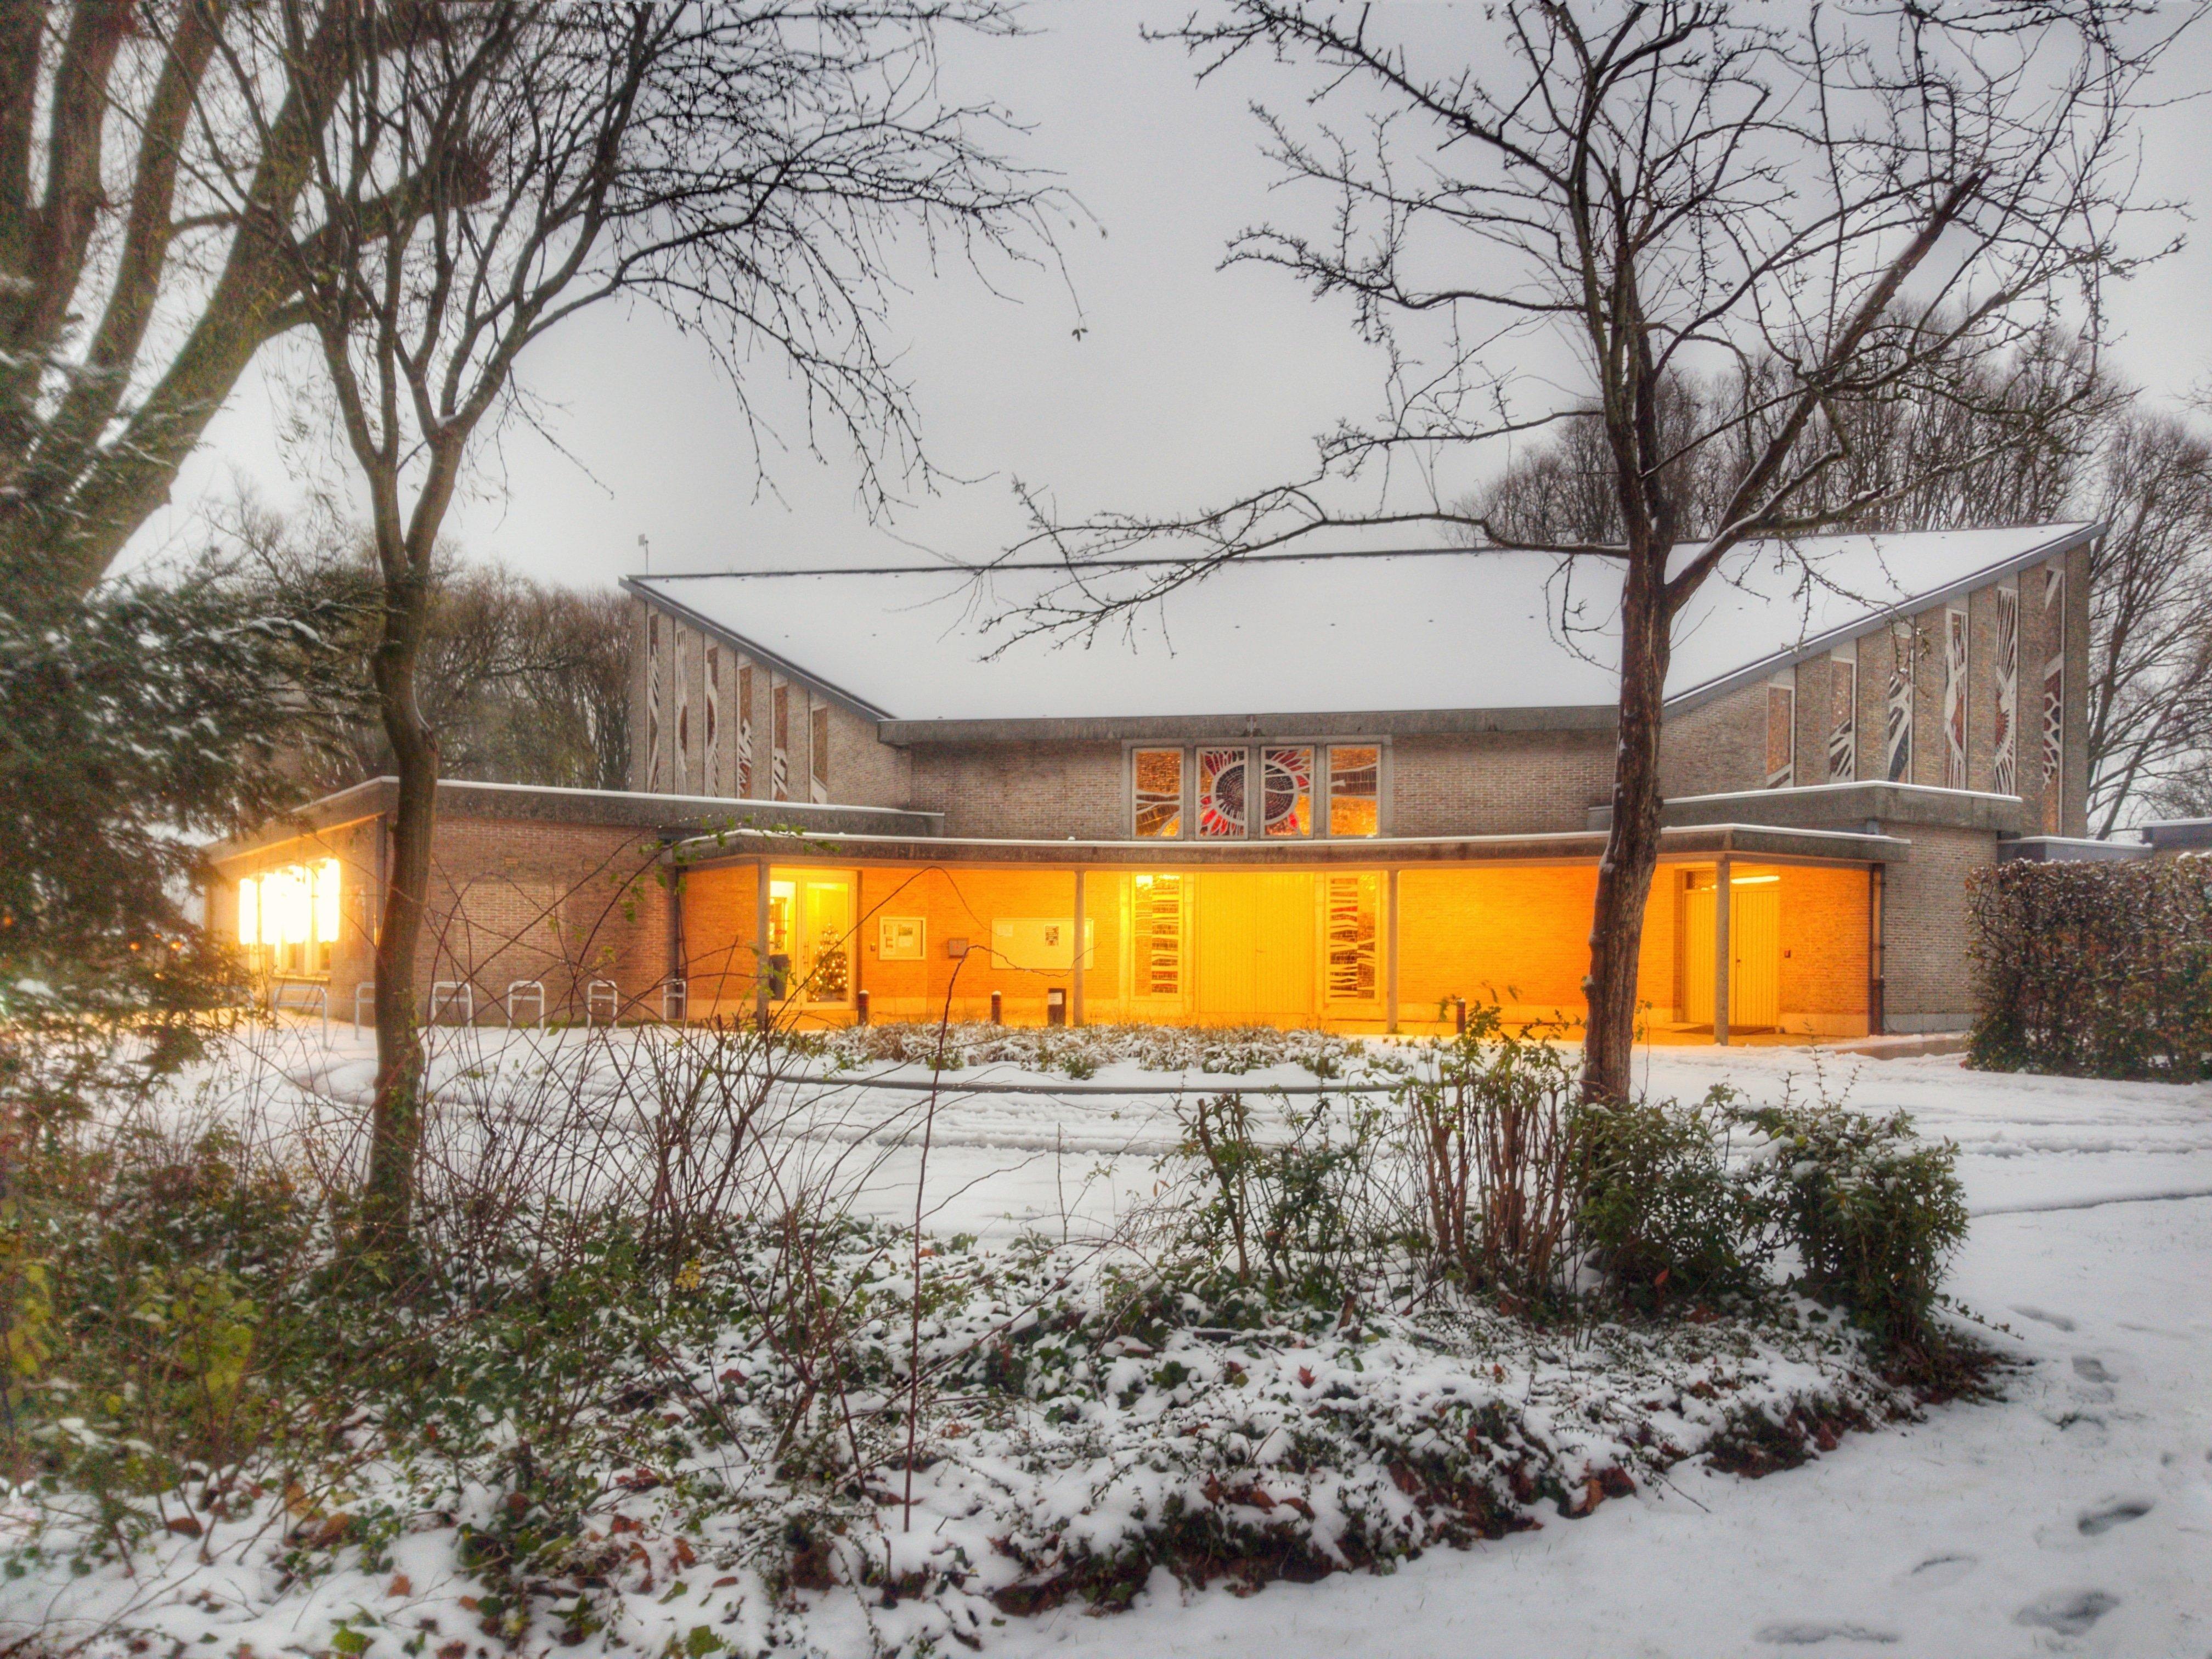 Buurtbibliotheek Lange Munte Kortrijk Beeklaan 81, Train, Snow, Sky, Railroad, HQ Photo